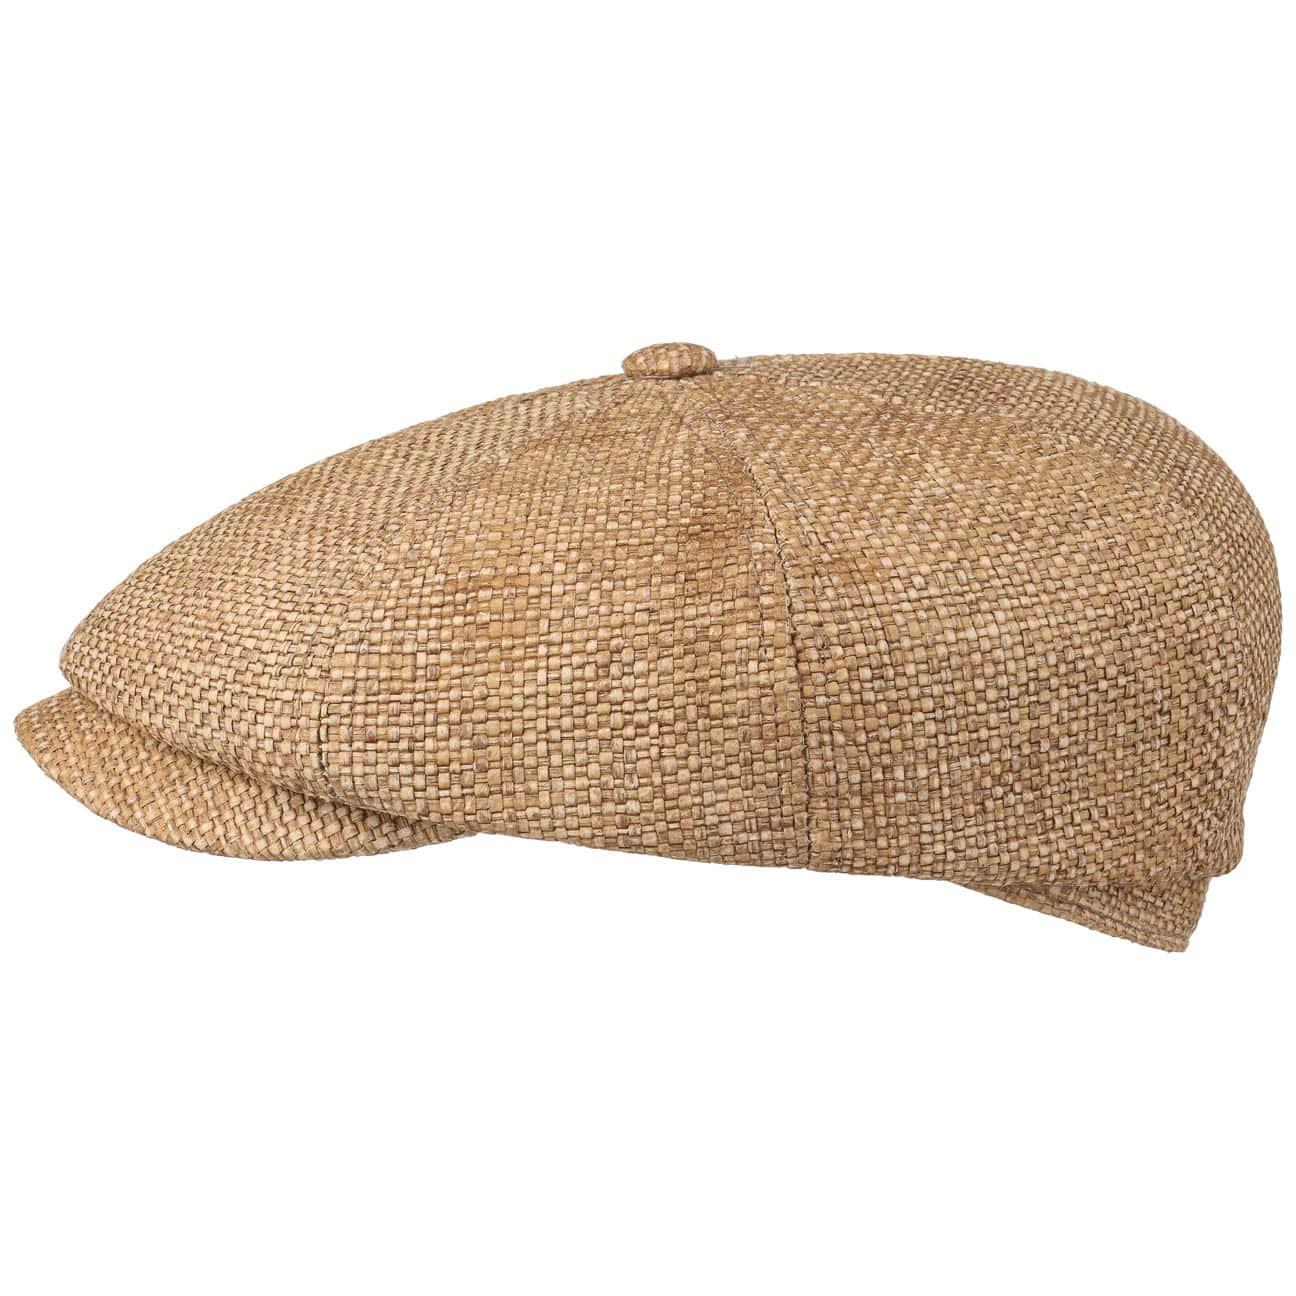 Hatteras Toyo Classic Flat Cap by Stetson  straw cap